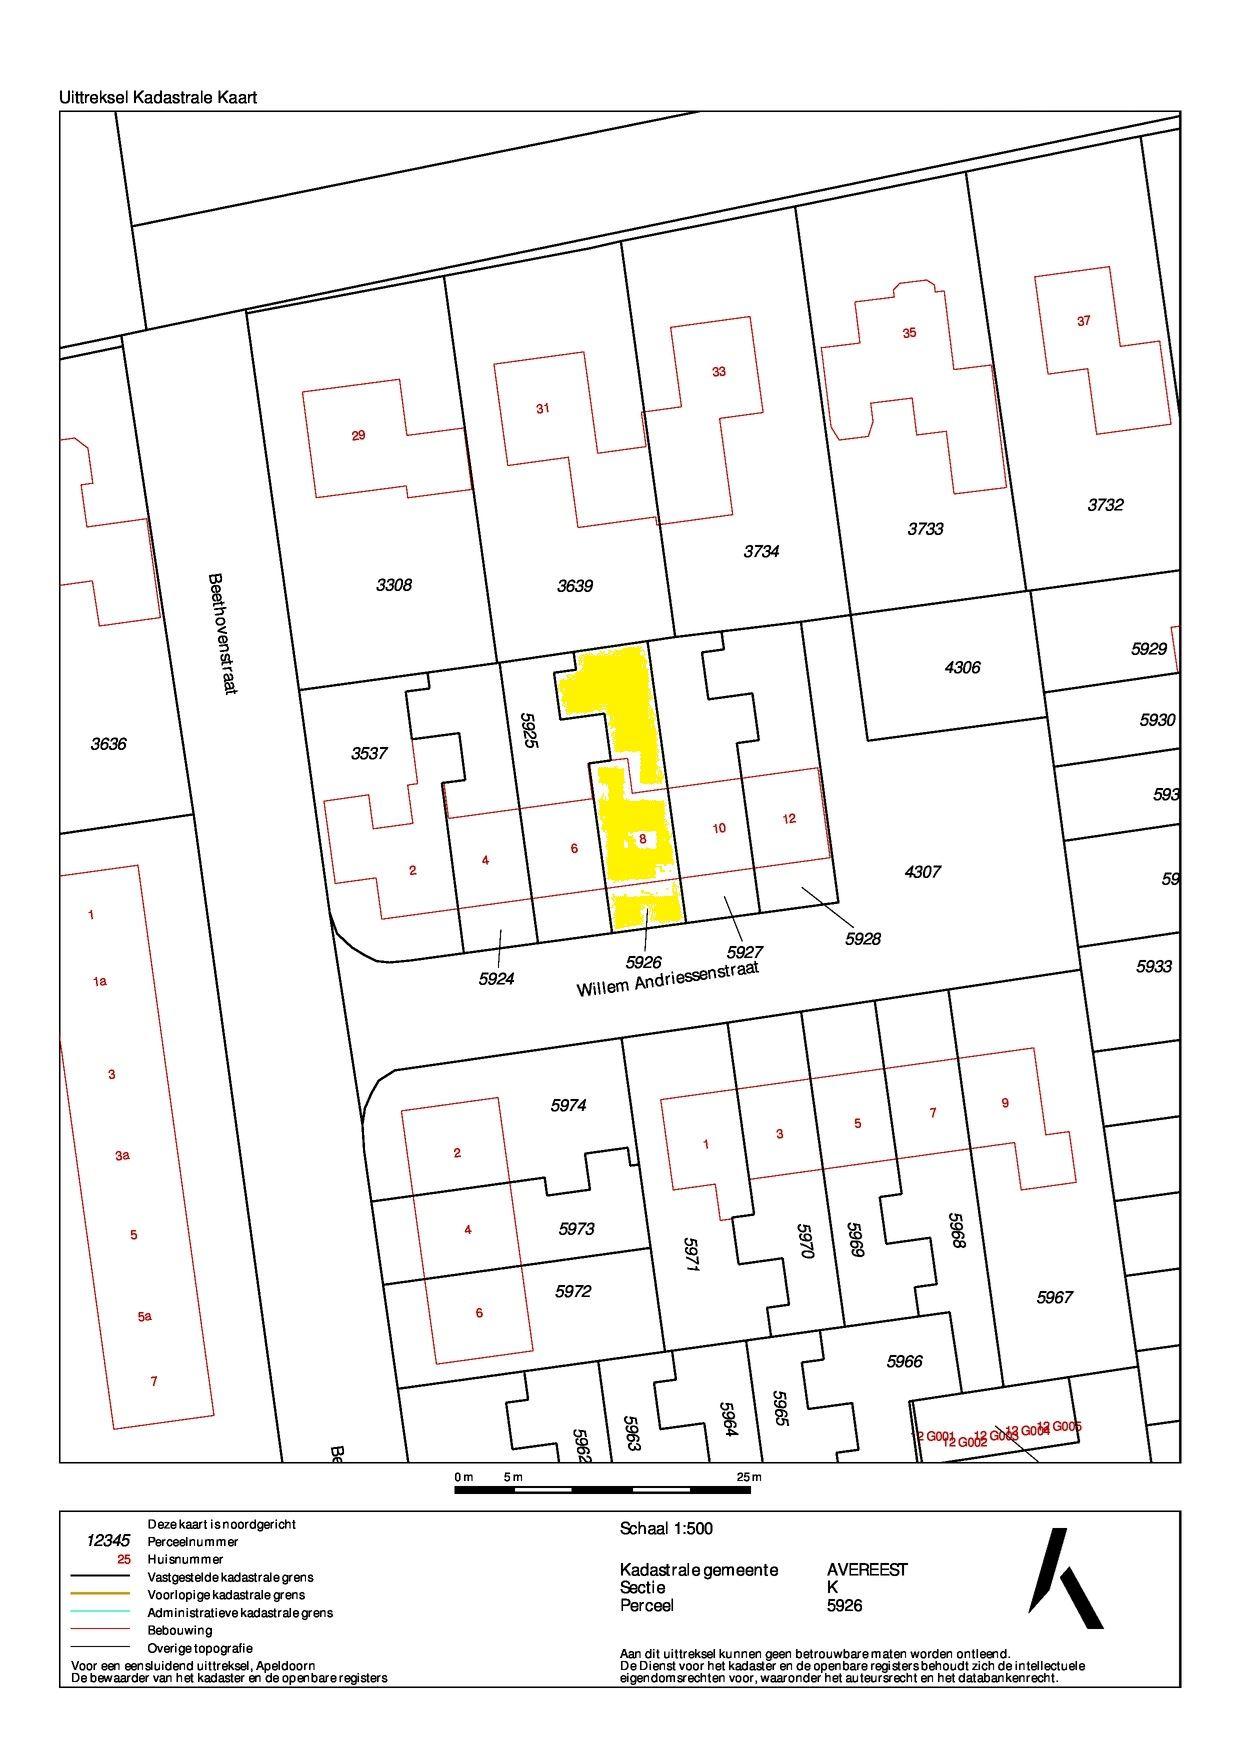 Huis te koop: Willem Andriessenstraat 8 7701 TC